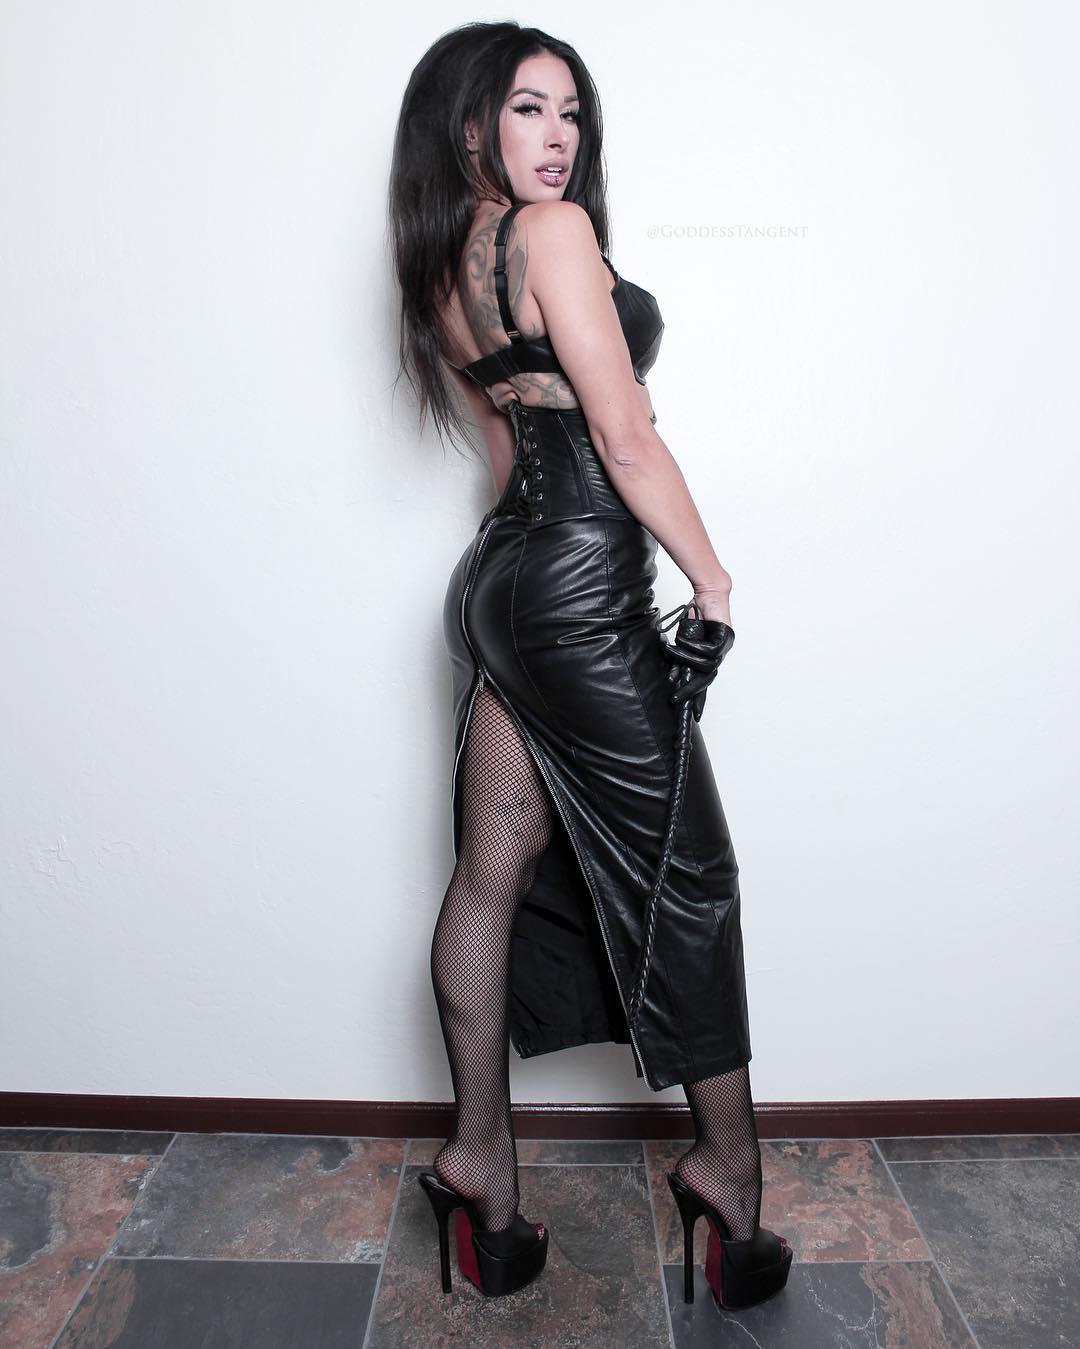 Lara Larsen | Alternative outfits, Insta fashion, Fashion